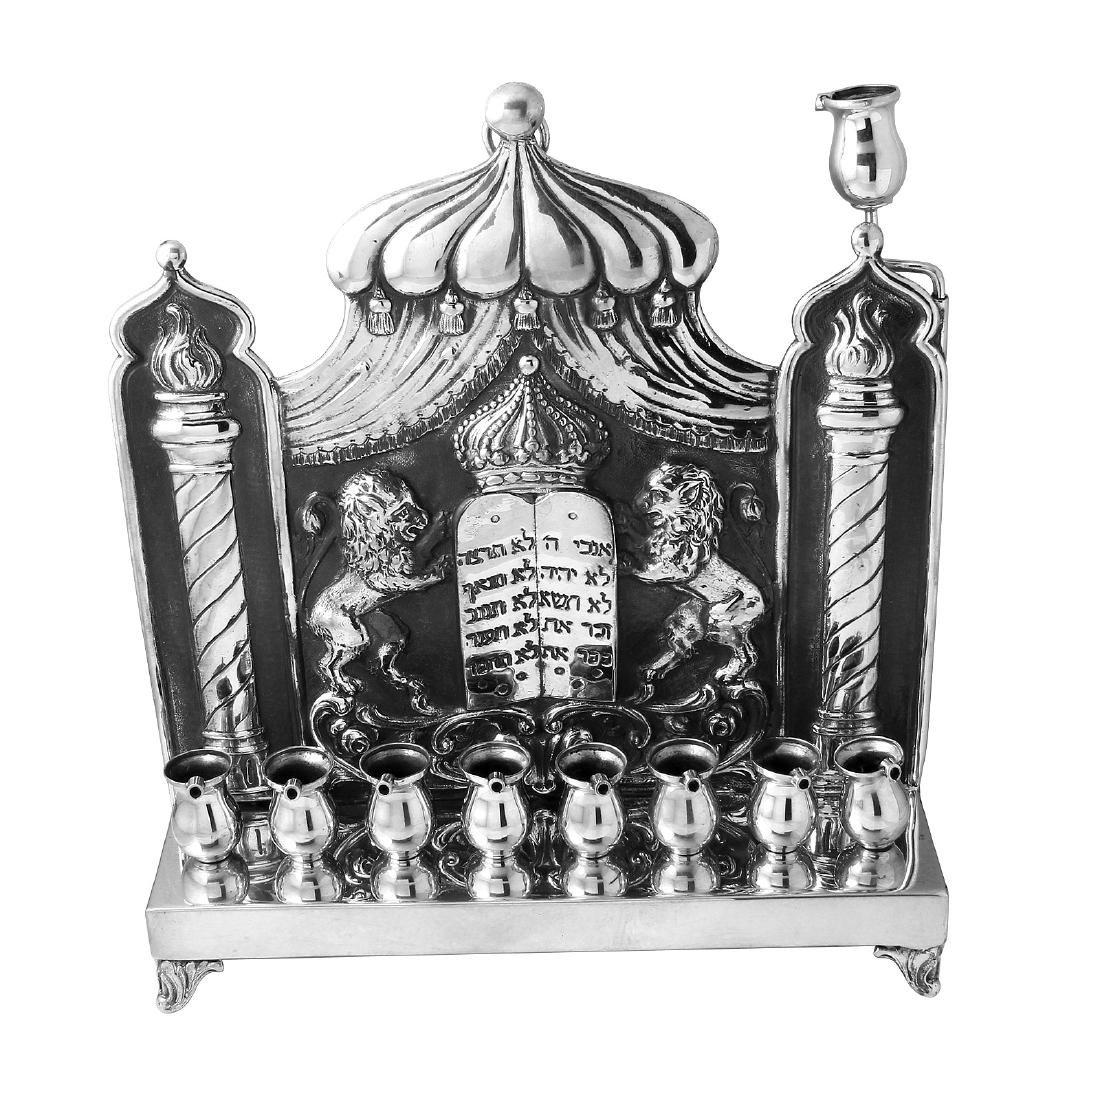 Karl Junker Antique Hanukkah Menorah